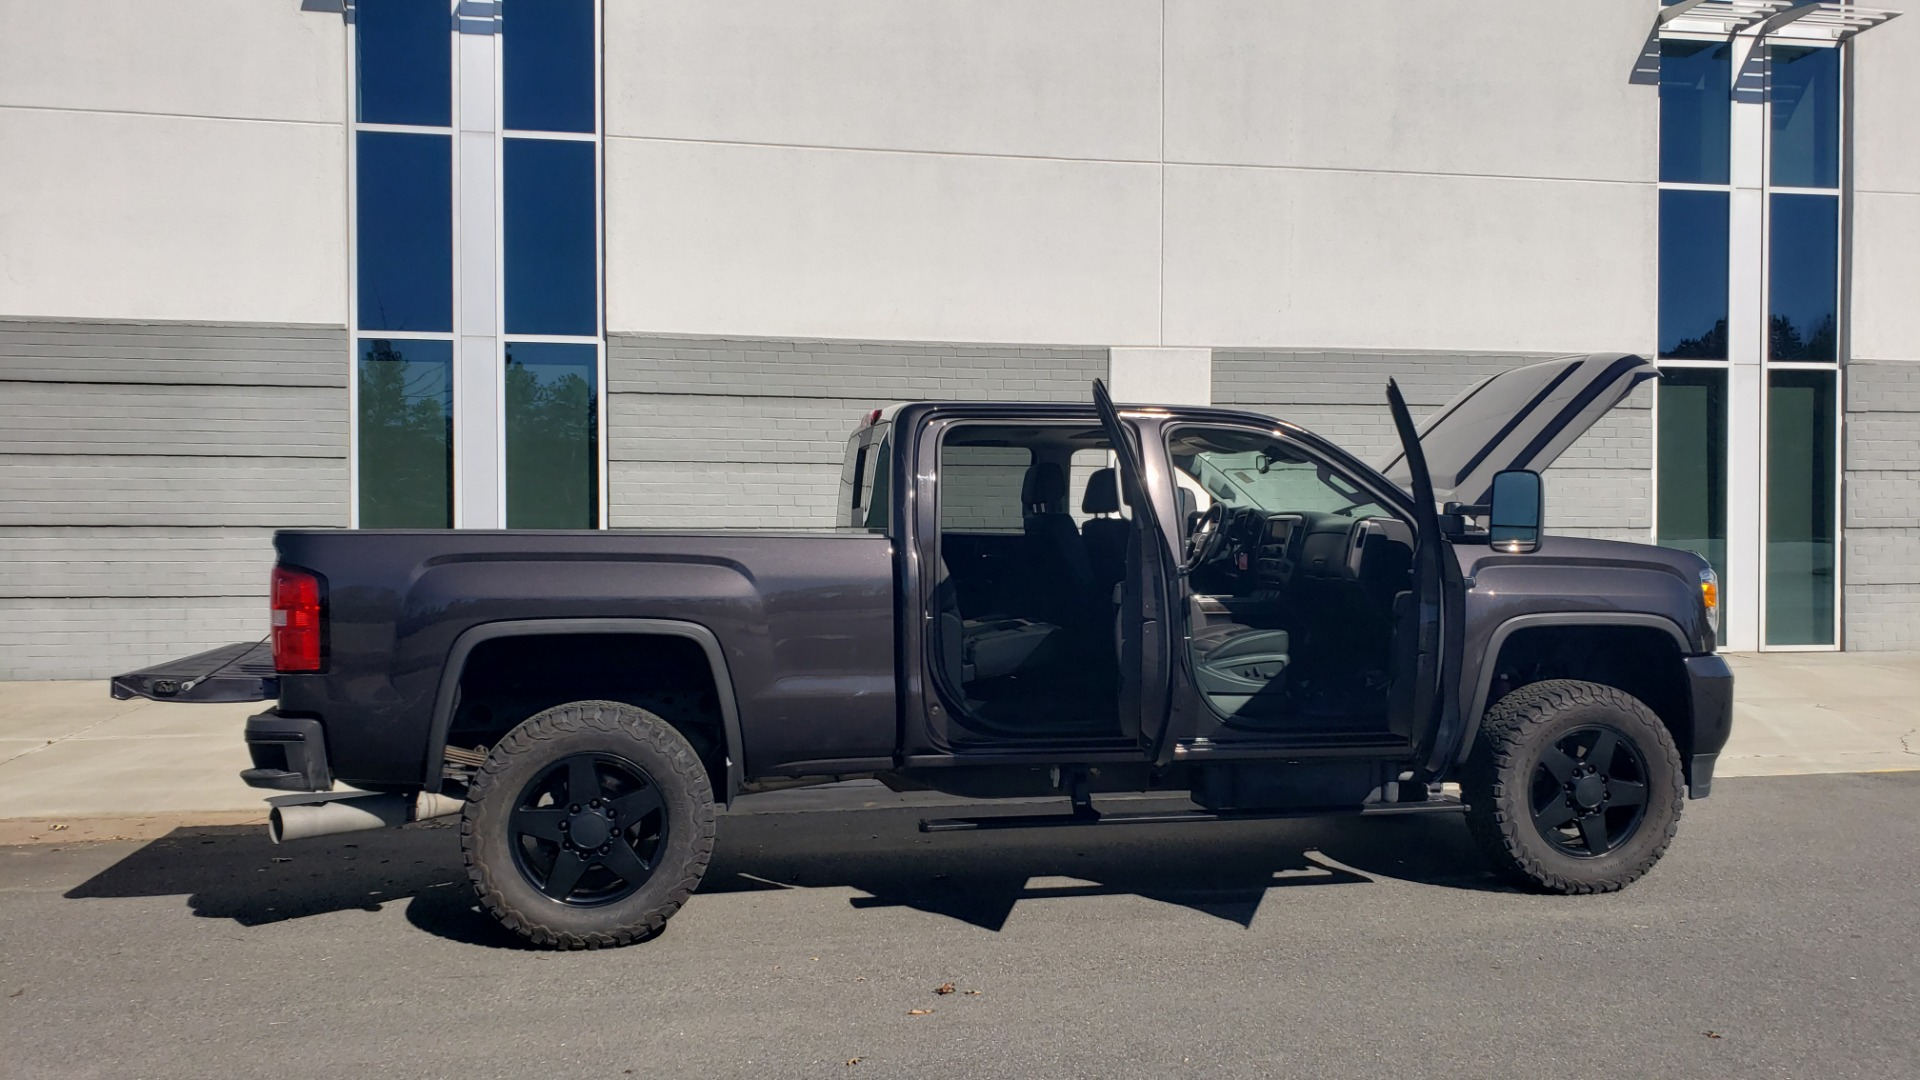 Used 2015 GMC SIERRA 2500HD DENALI 4WD CREWCAB / 6.6L DURAMAX / 6-SPD AUTO / NAV / BOSE for sale $50,995 at Formula Imports in Charlotte NC 28227 13